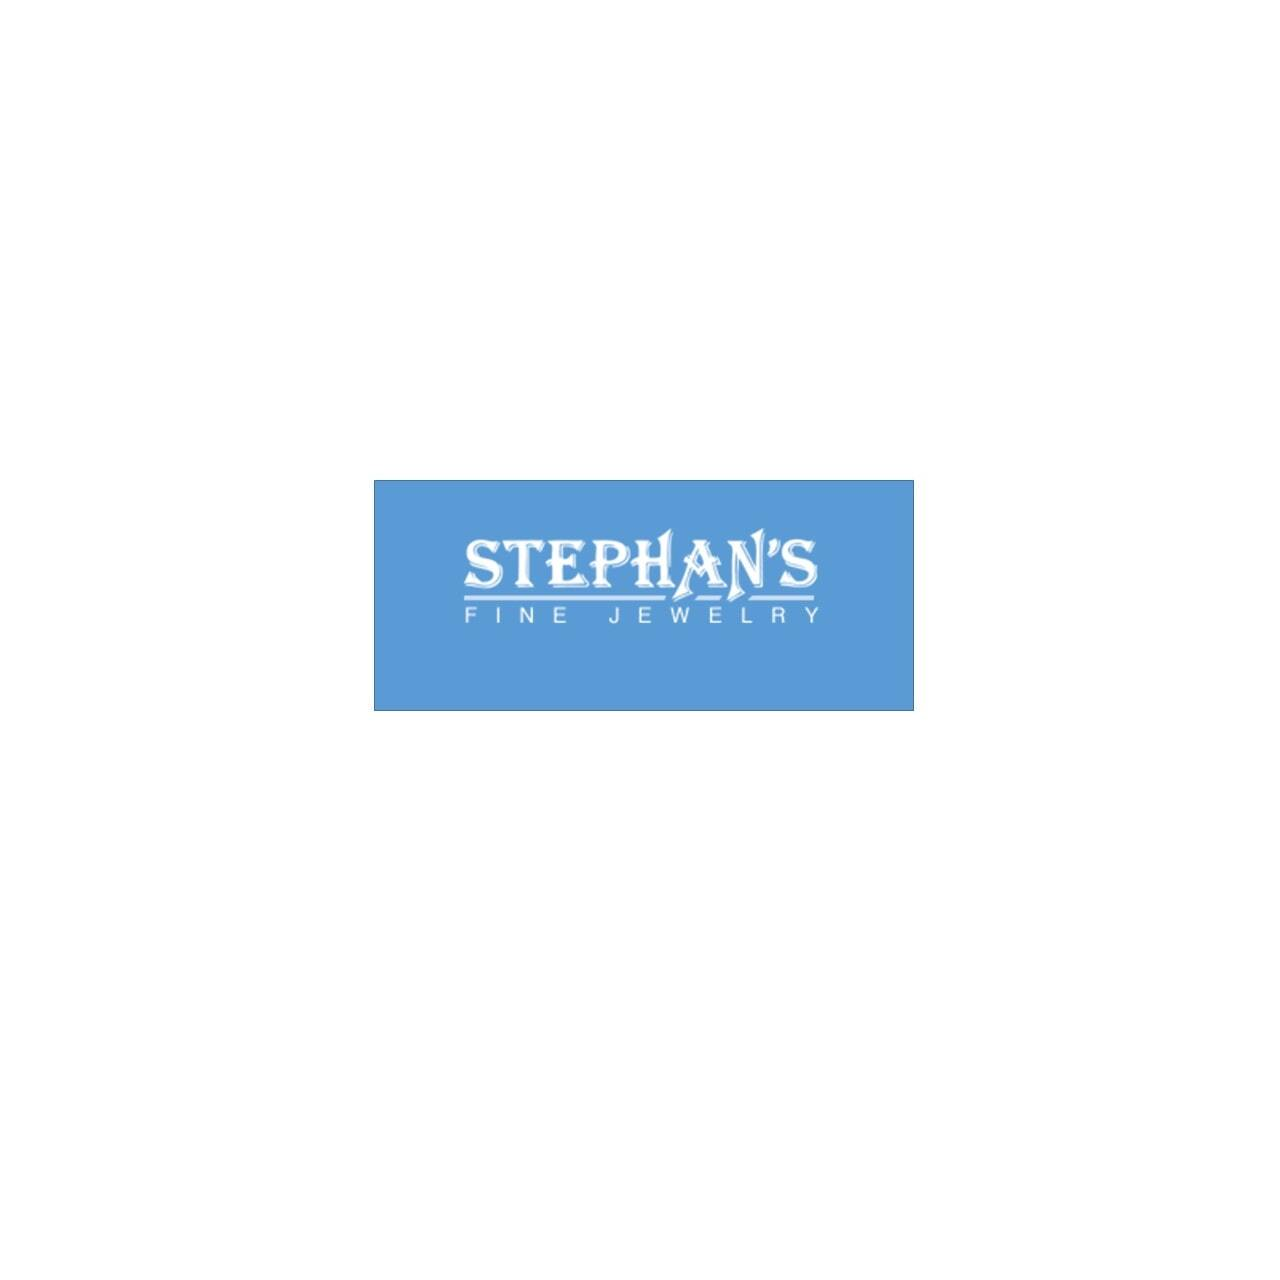 Stephan's Fine Jewelry image 0